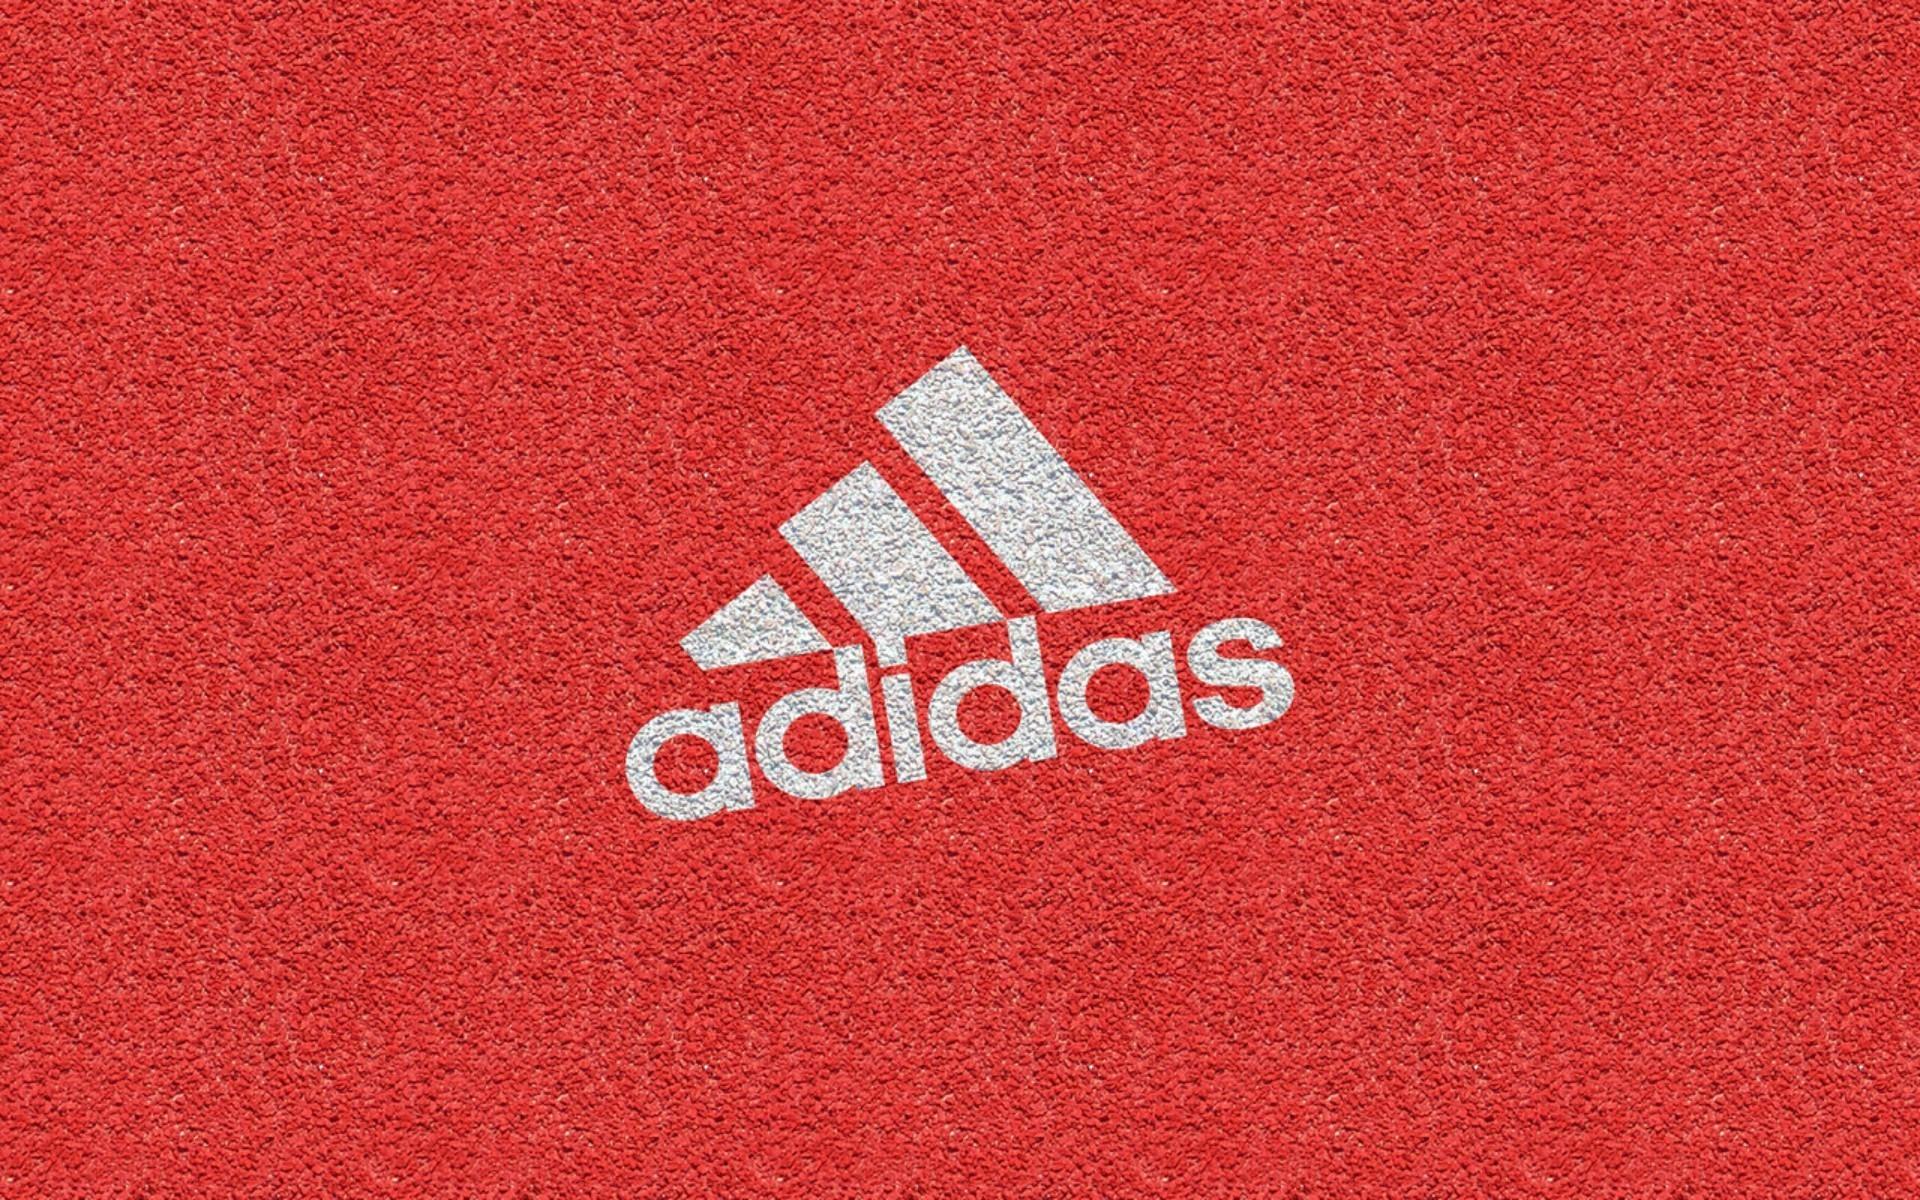 adidas screensavers, sports iphone wallpapers